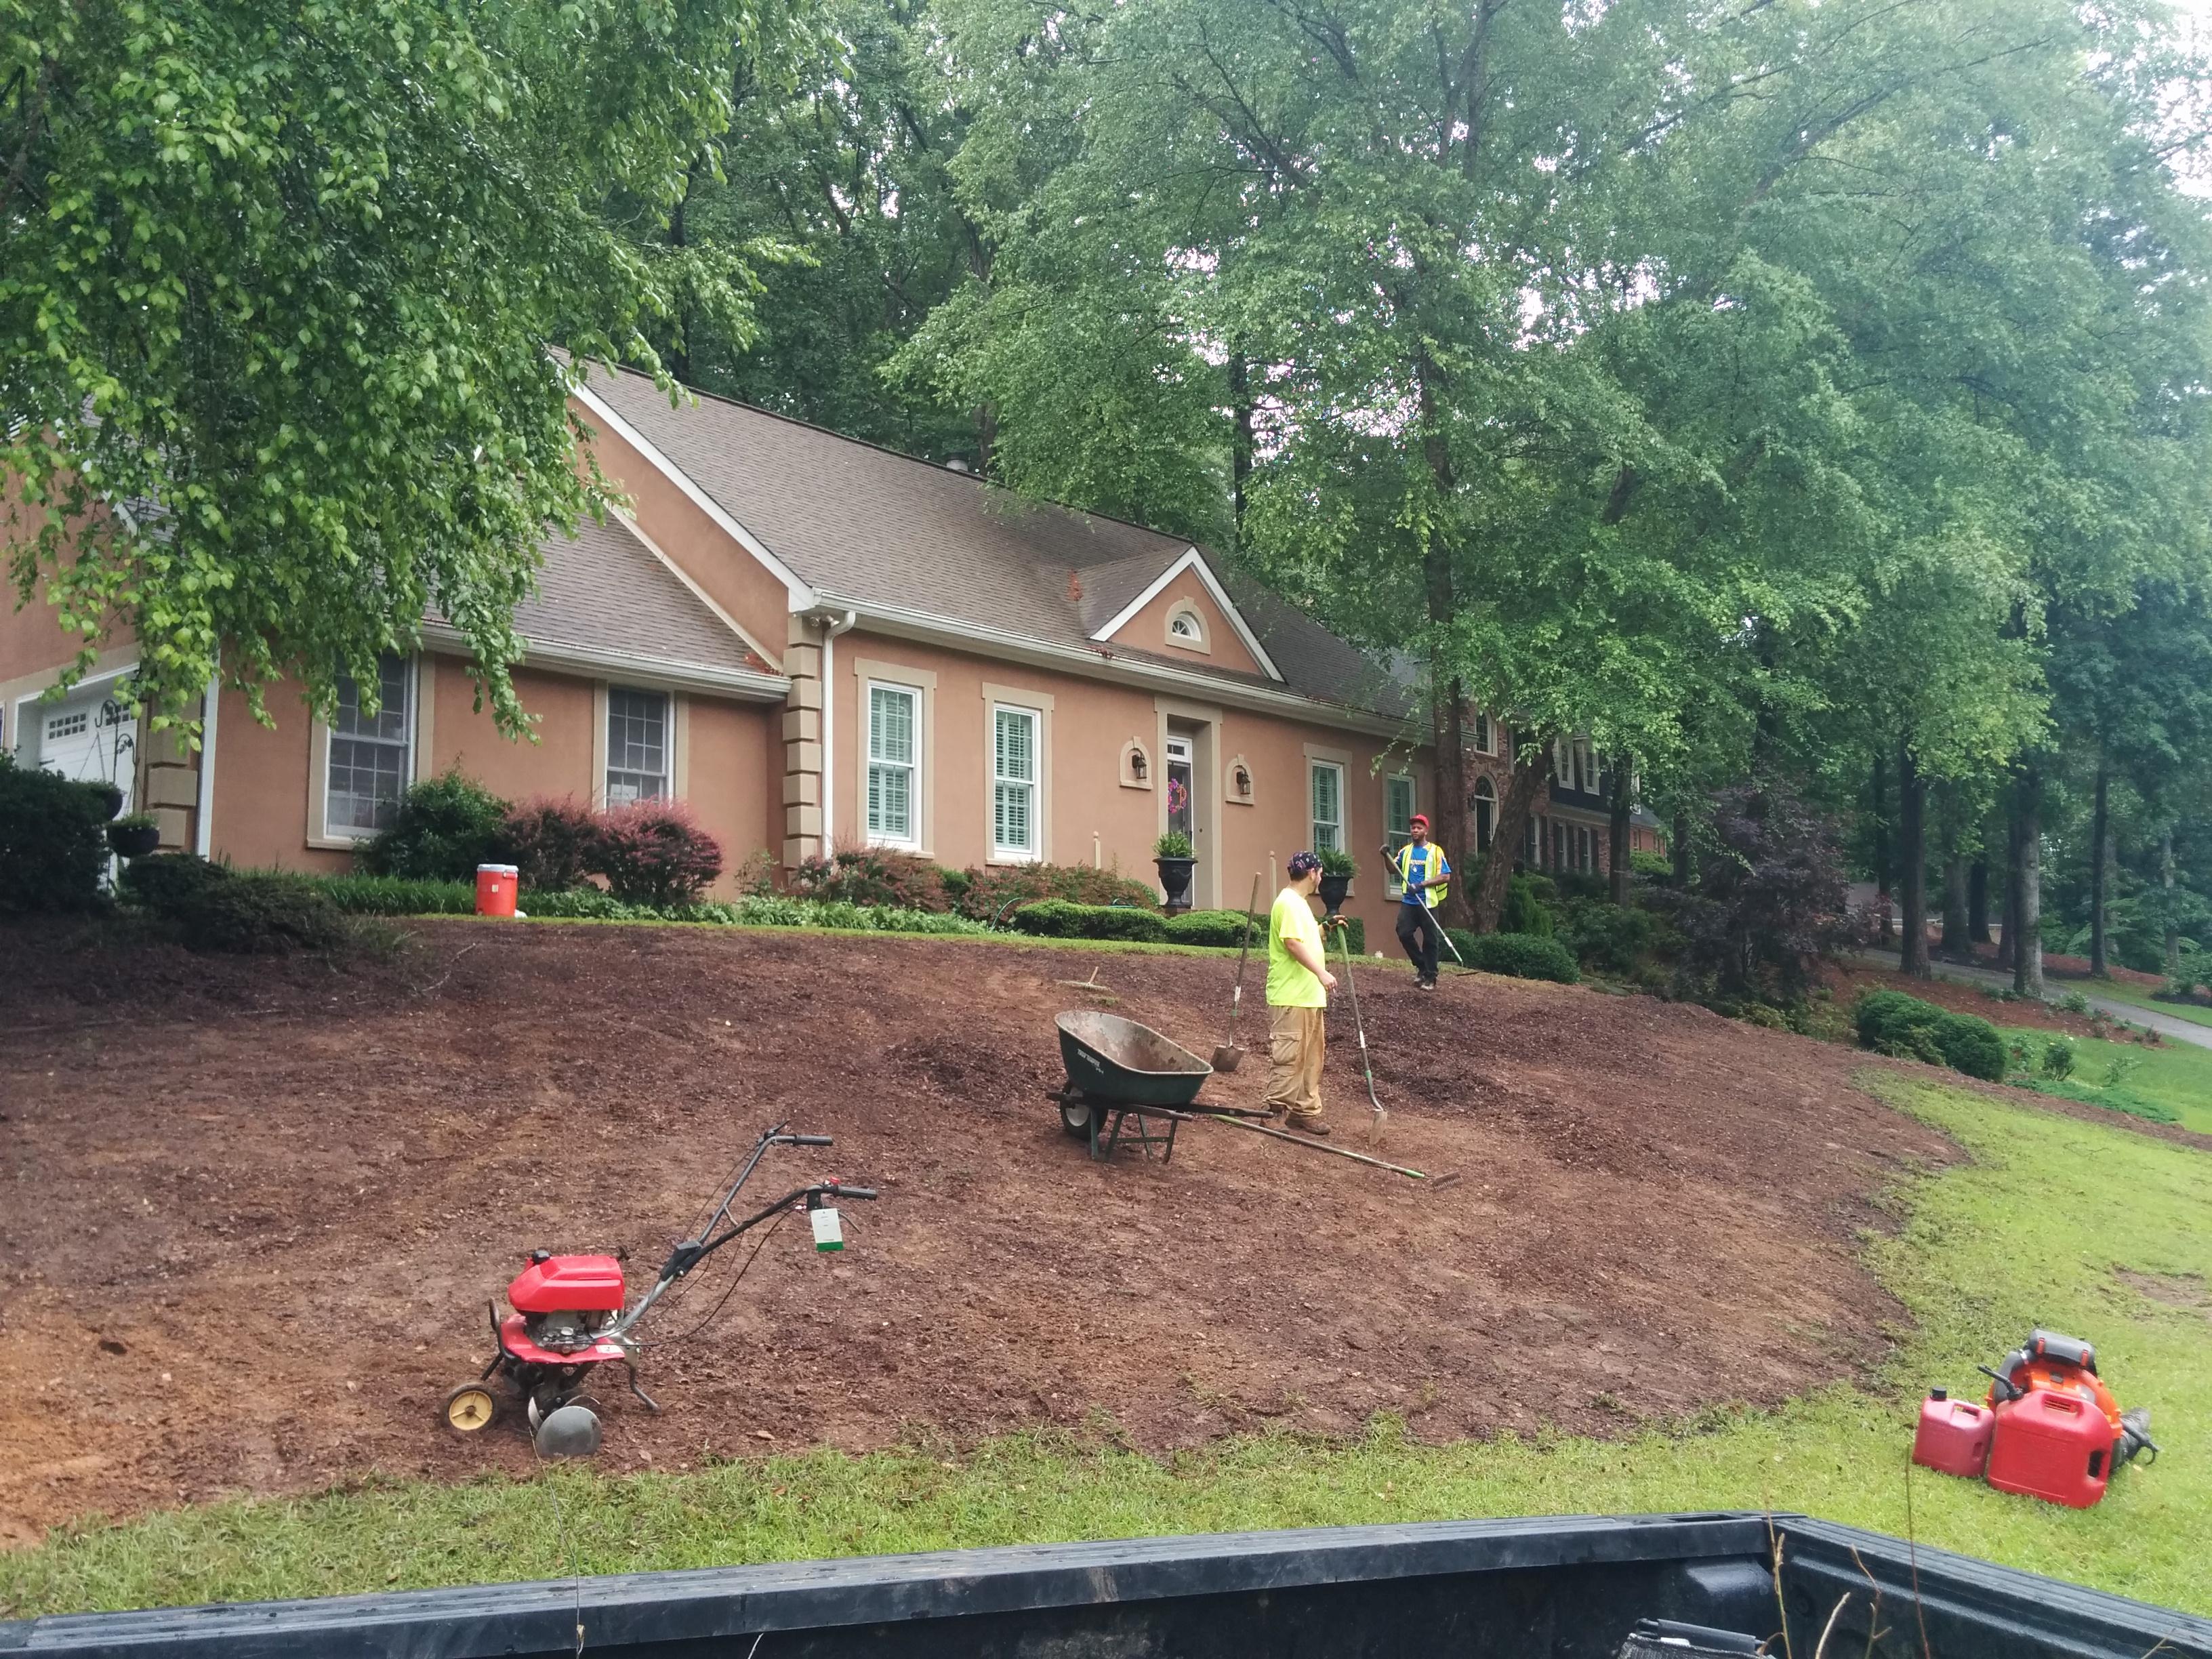 Lawn Mowing Contractor in Marietta, GA, 30062